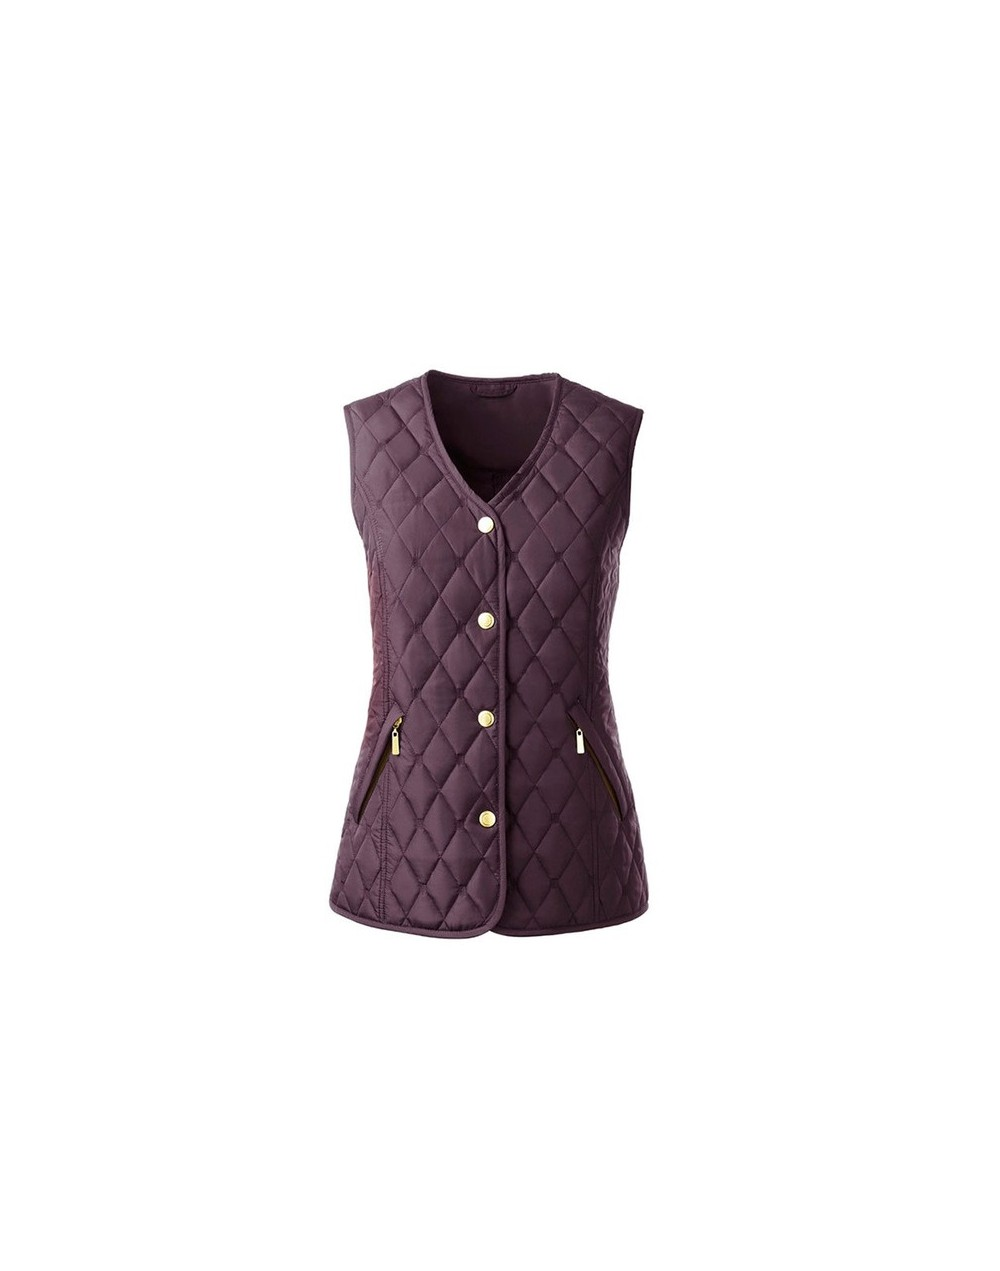 Women Vest basic Autumn Winter Female waistcoat padded sleeveless Jacket lady casual brand outerwear plus size 5XL 7XL - Ber...